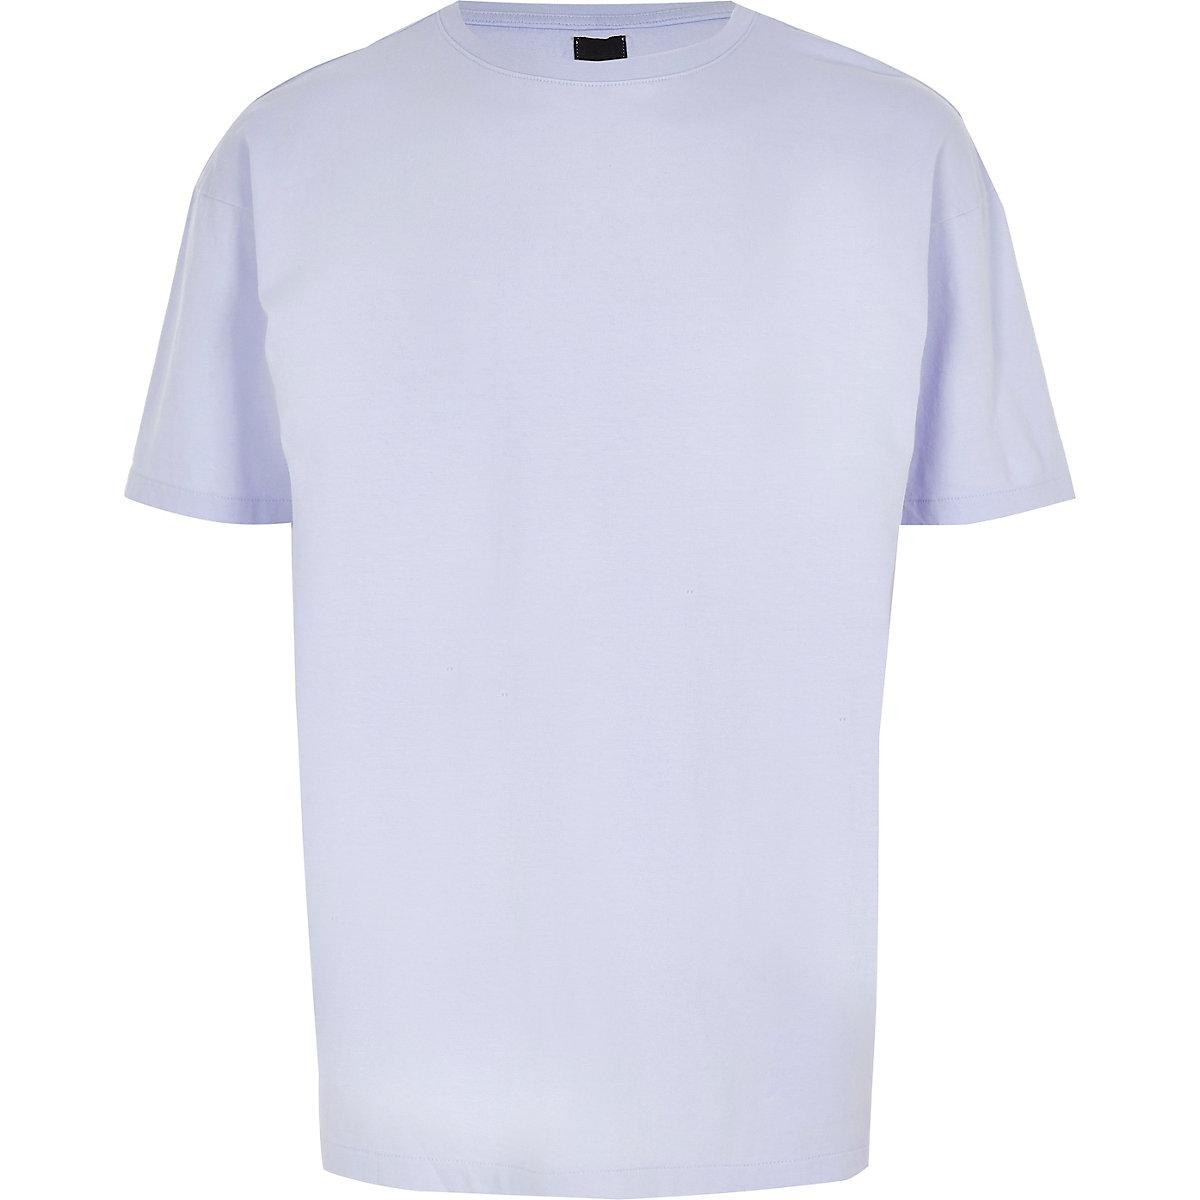 Purple oversized T-shirt